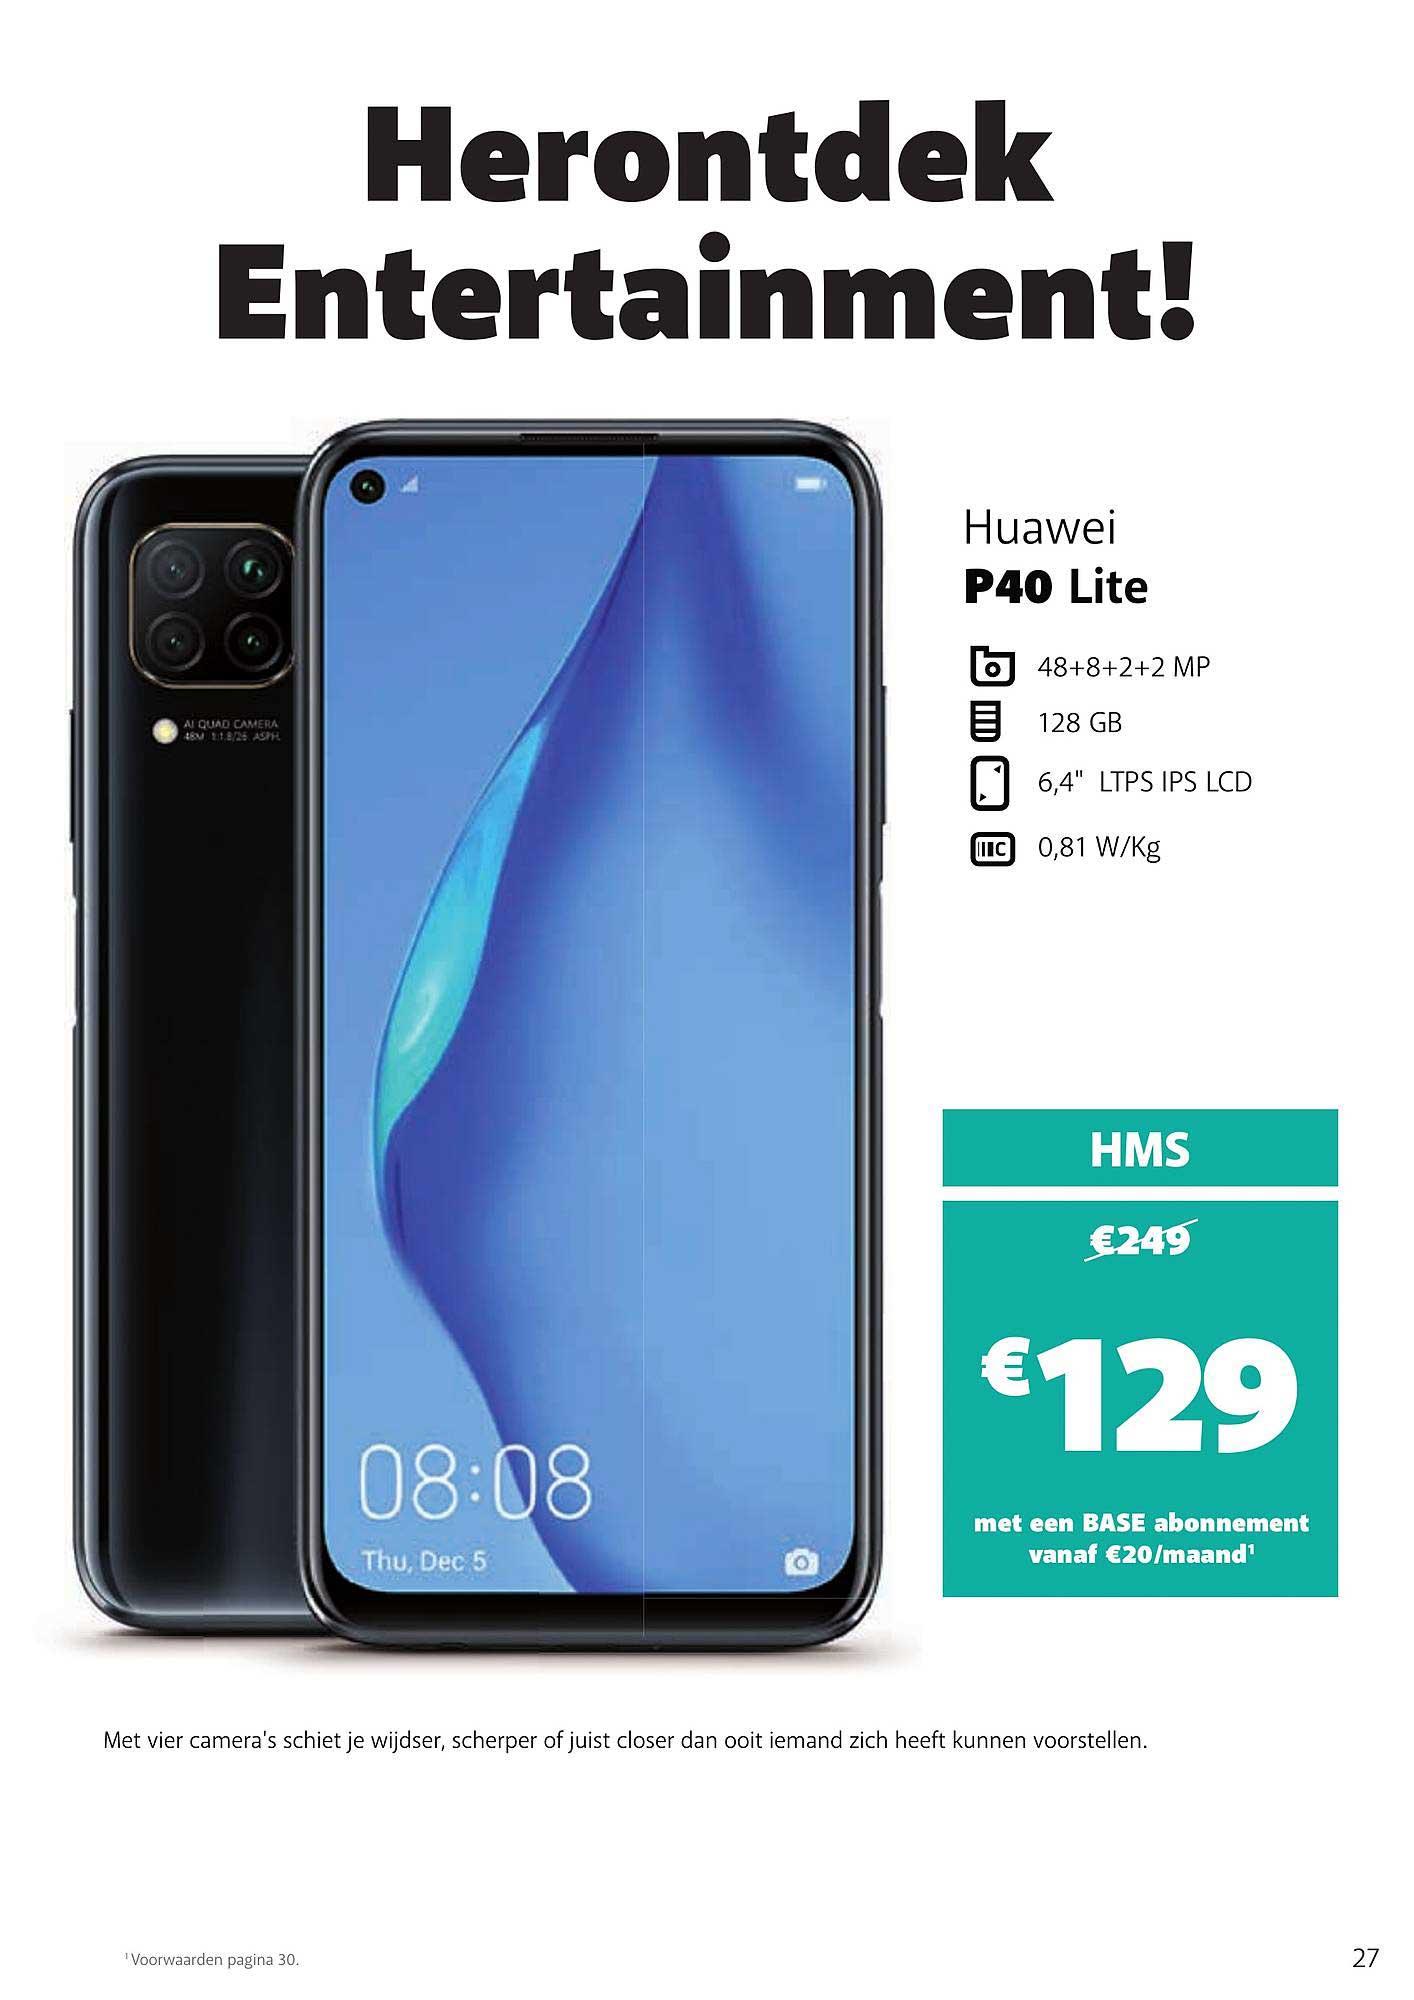 Base Huawei P40 Lite